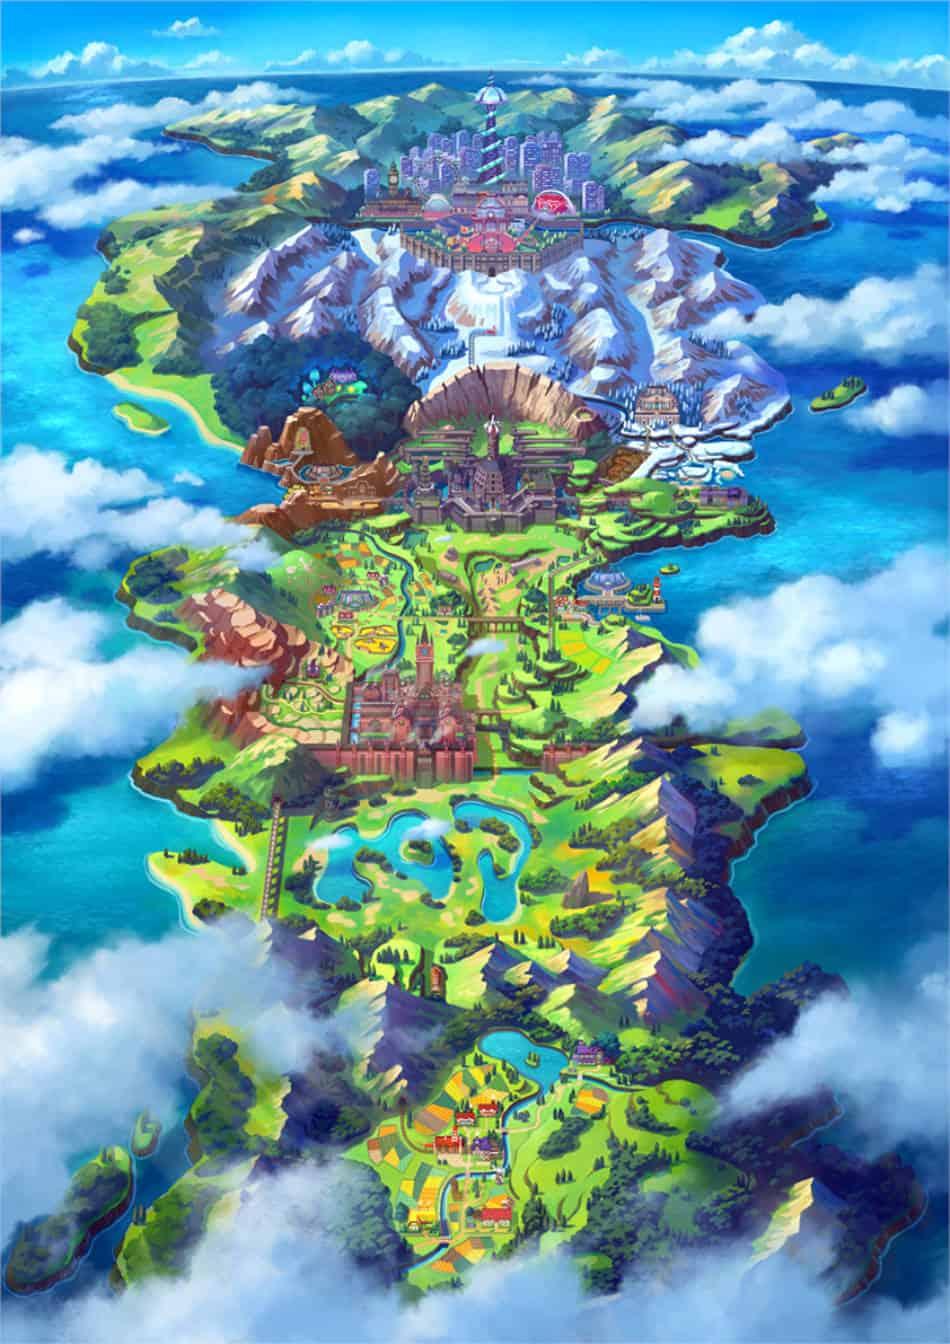 Pokémon Pokemon Sword und Shield